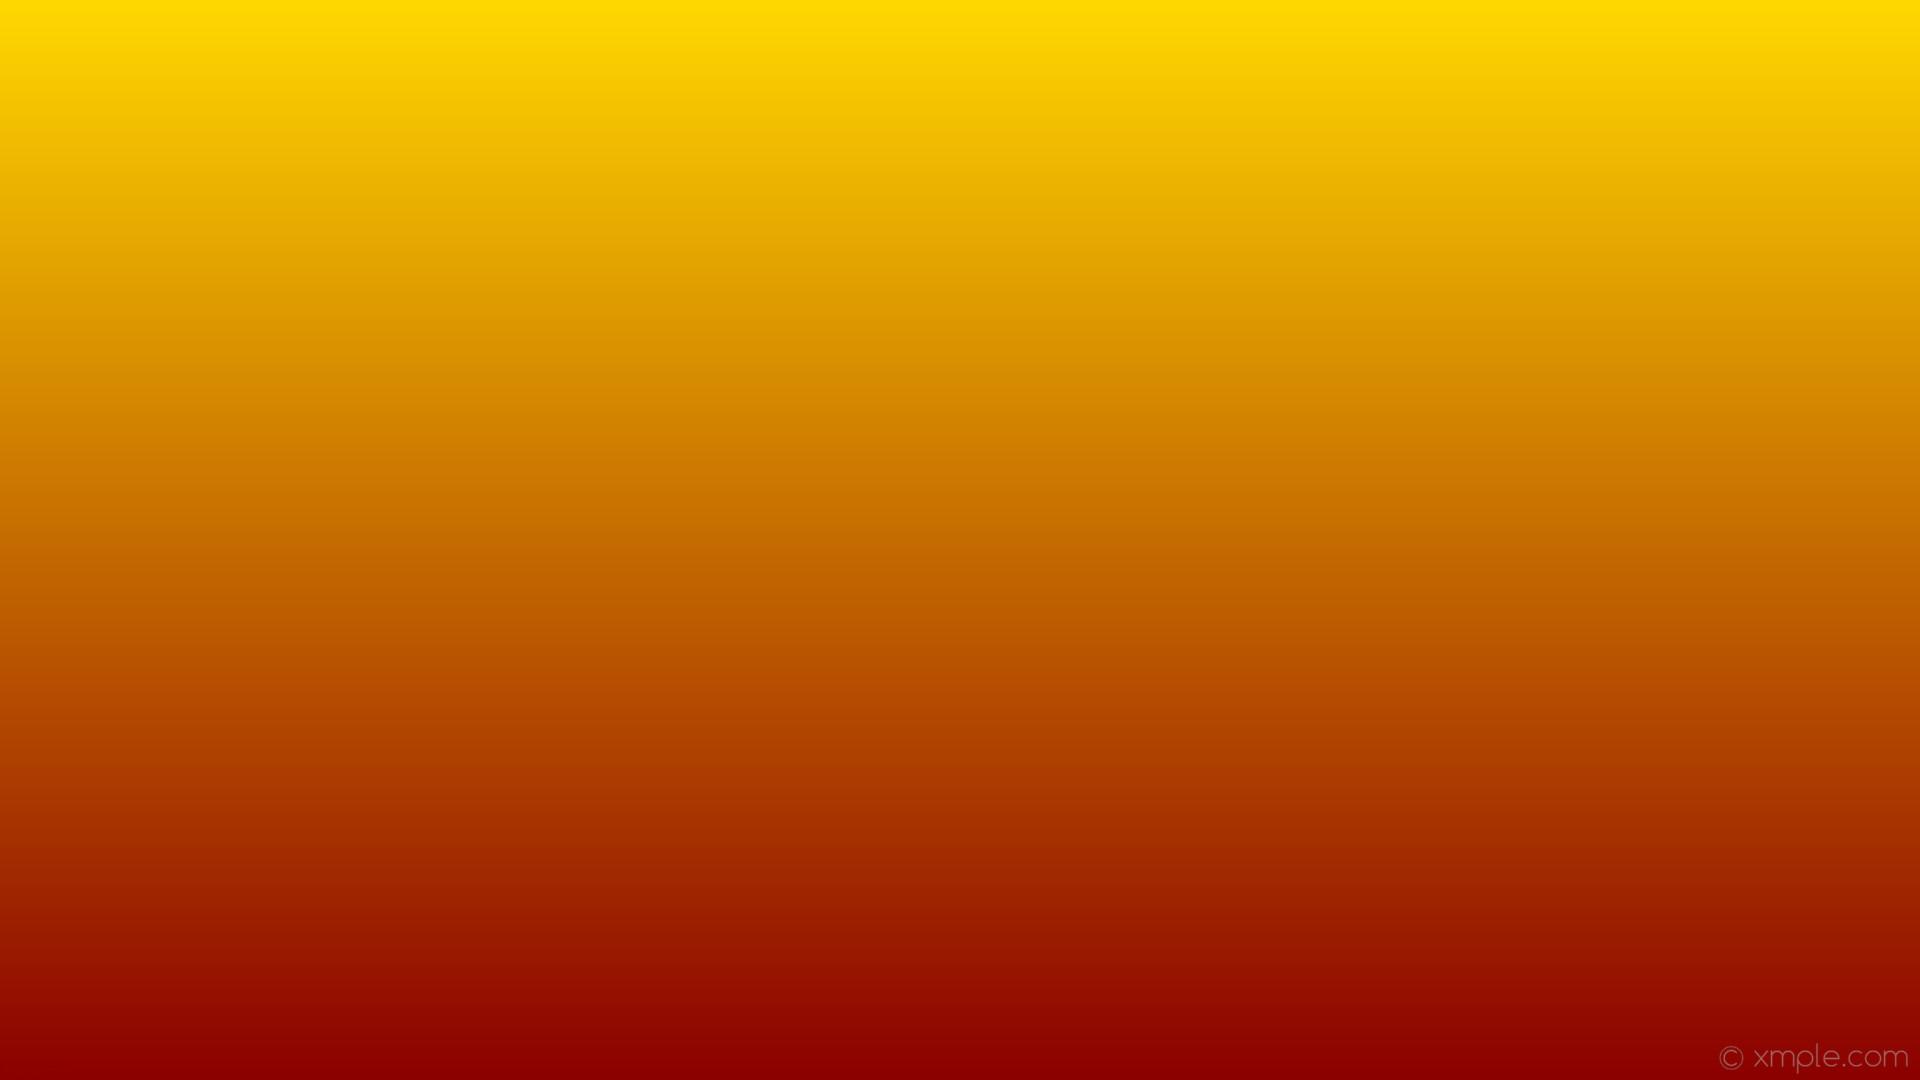 wallpaper linear gradient yellow red gold dark red #ffd700 #8b0000 90°